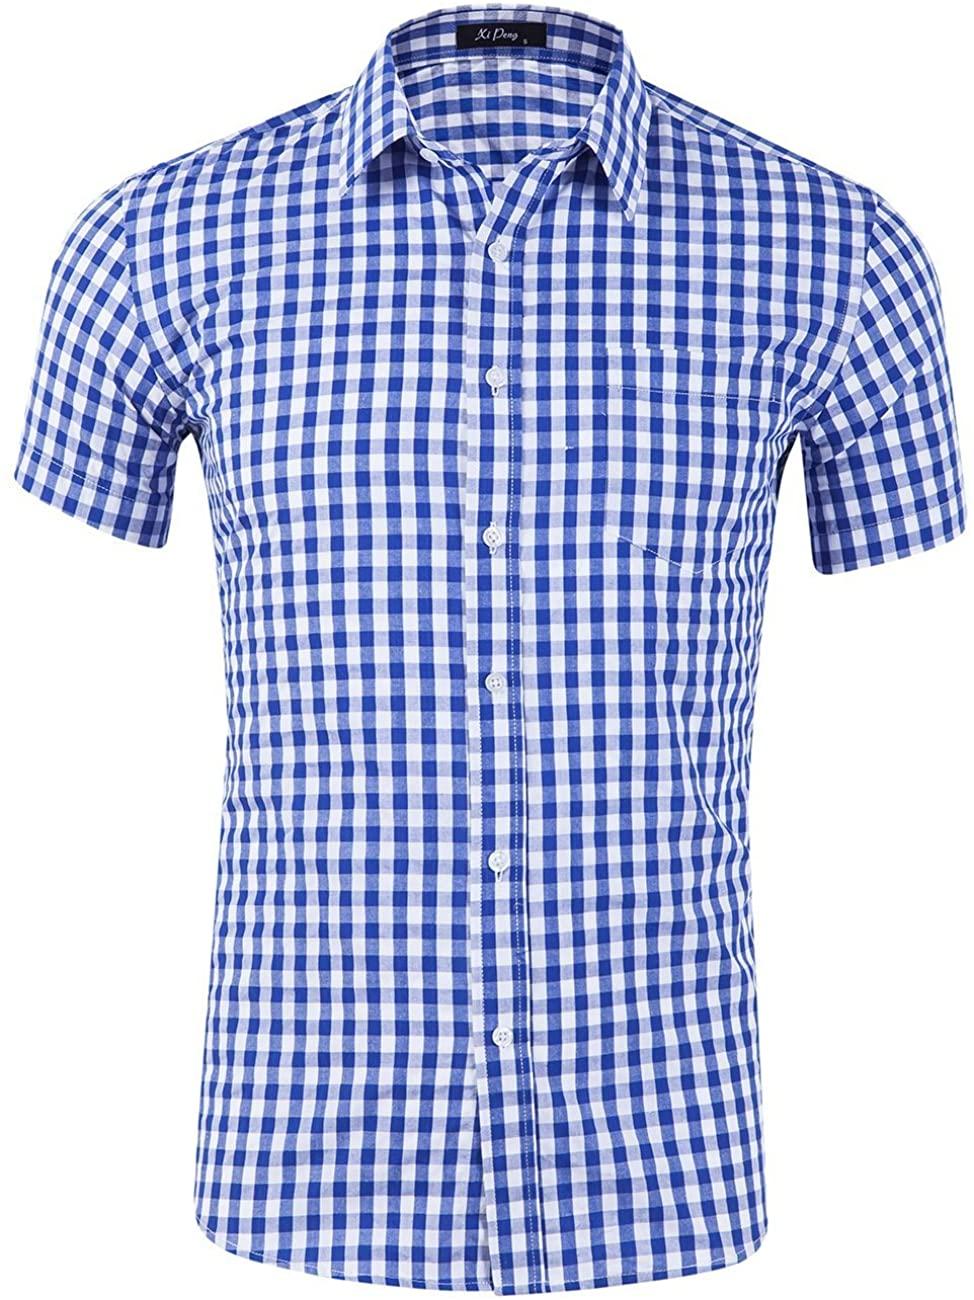 XI PENG Men's Casual Cotton Plaid Checkered Gingham Short Sleeve Dress Shirts